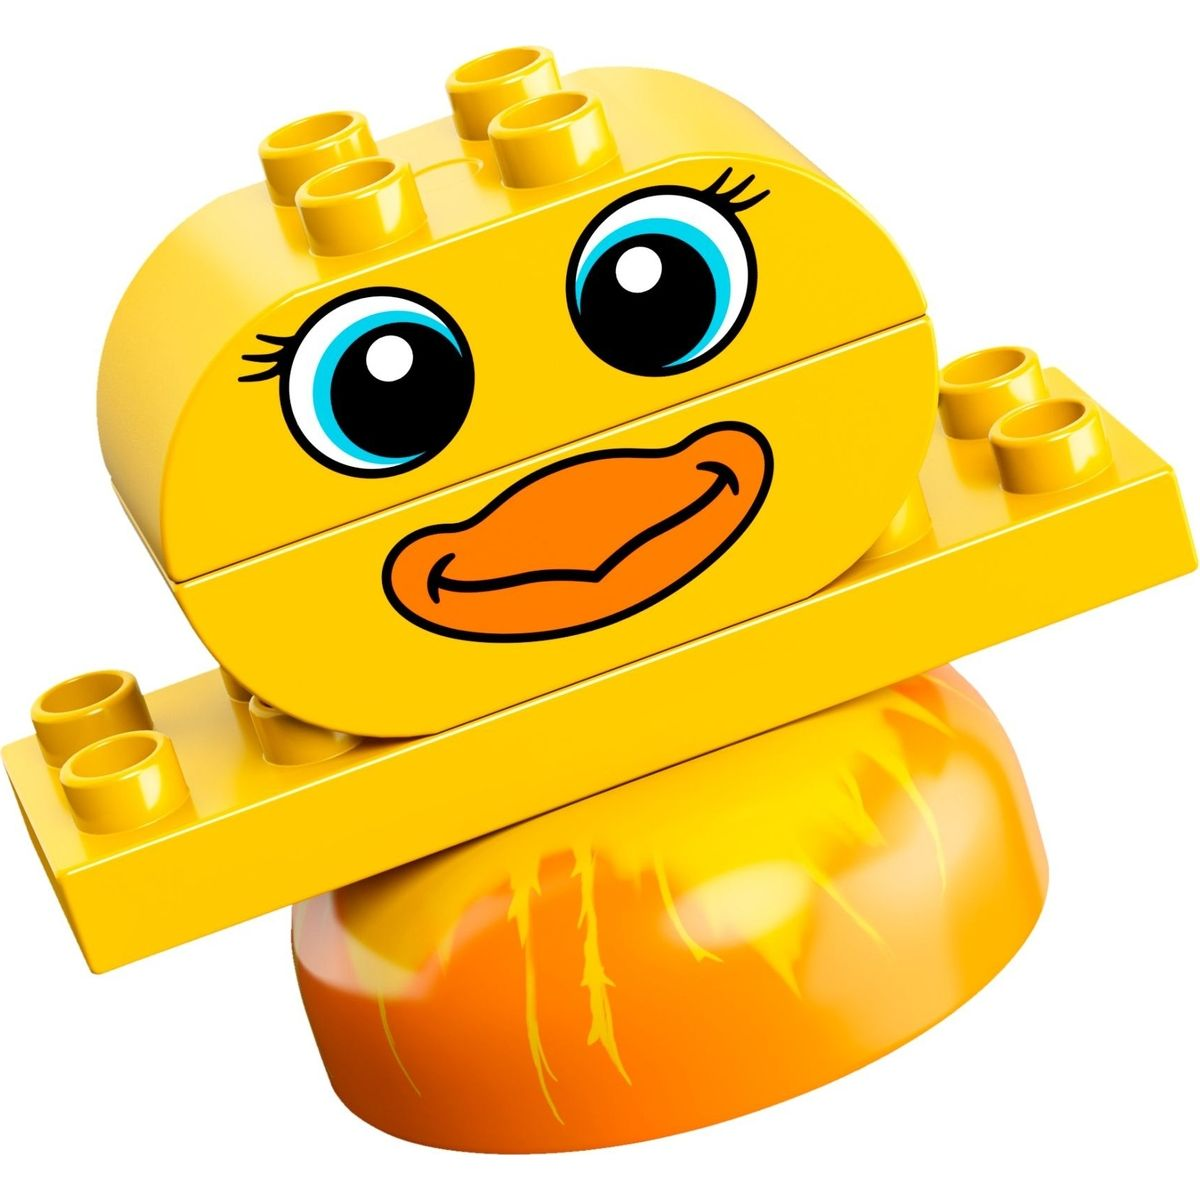 LEGO DUPLO 10858 Moji první skládací mazlíčci #3